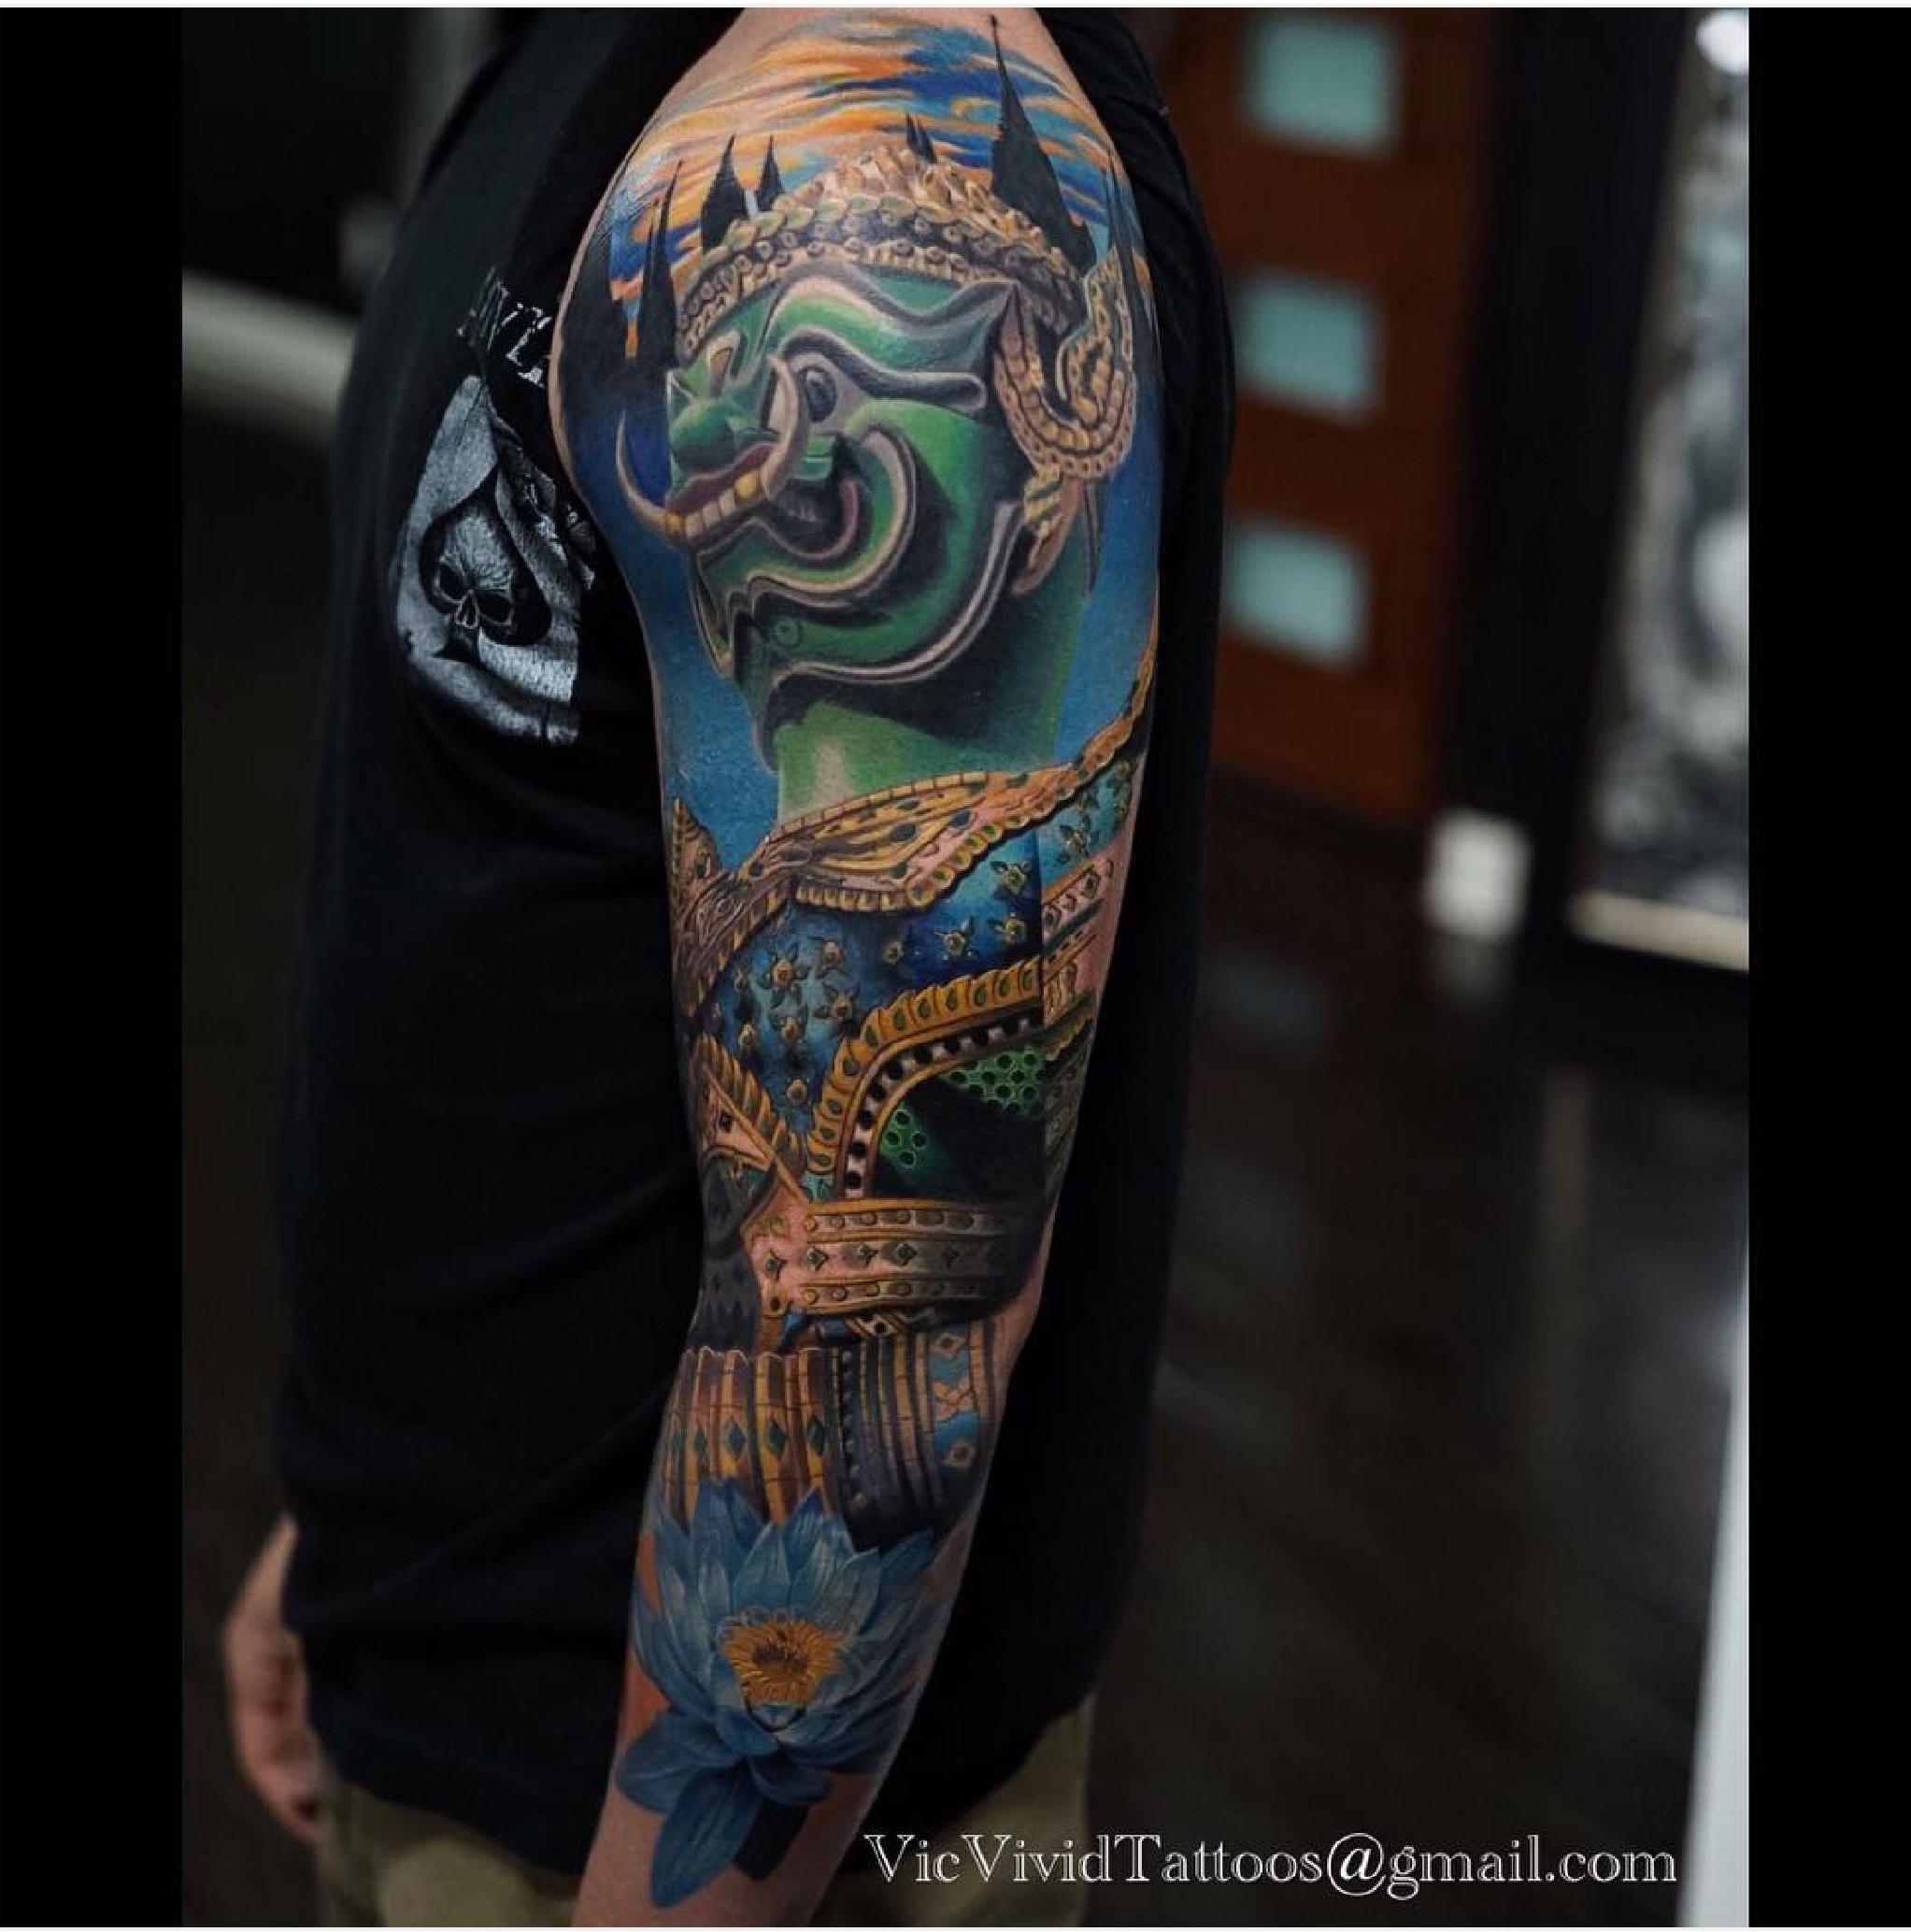 Las vegas tattoo pictures images photos photobucket - Vic Vivid Out Of Basilica In Las Vegas